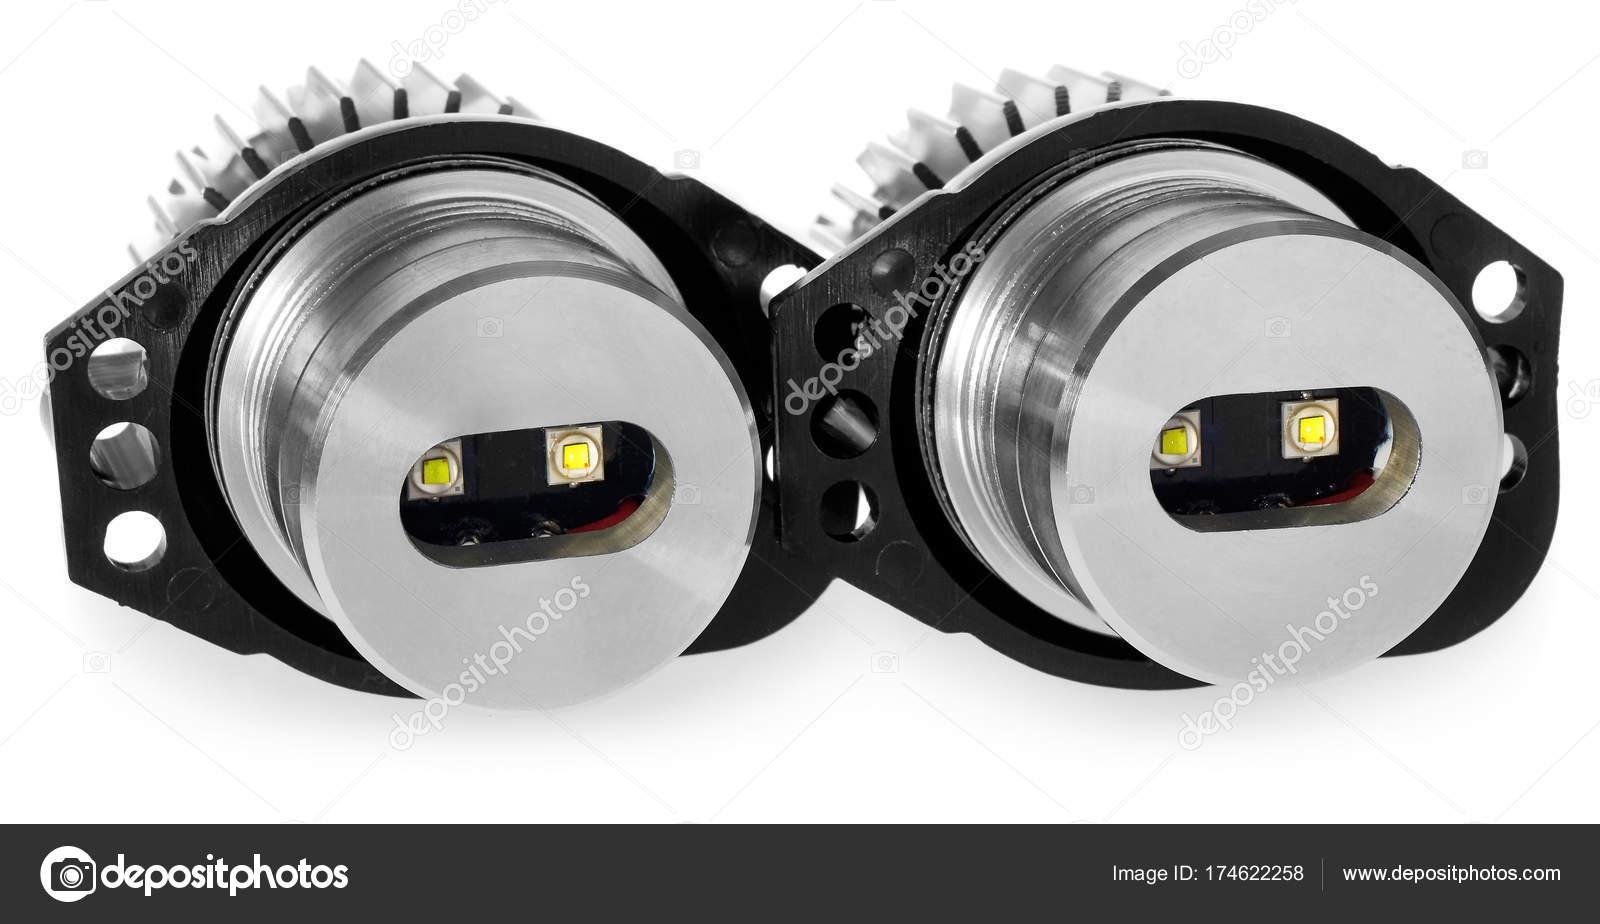 Led Lampen Auto : Licht led lampen für auto lampen auto led für halo ringe und